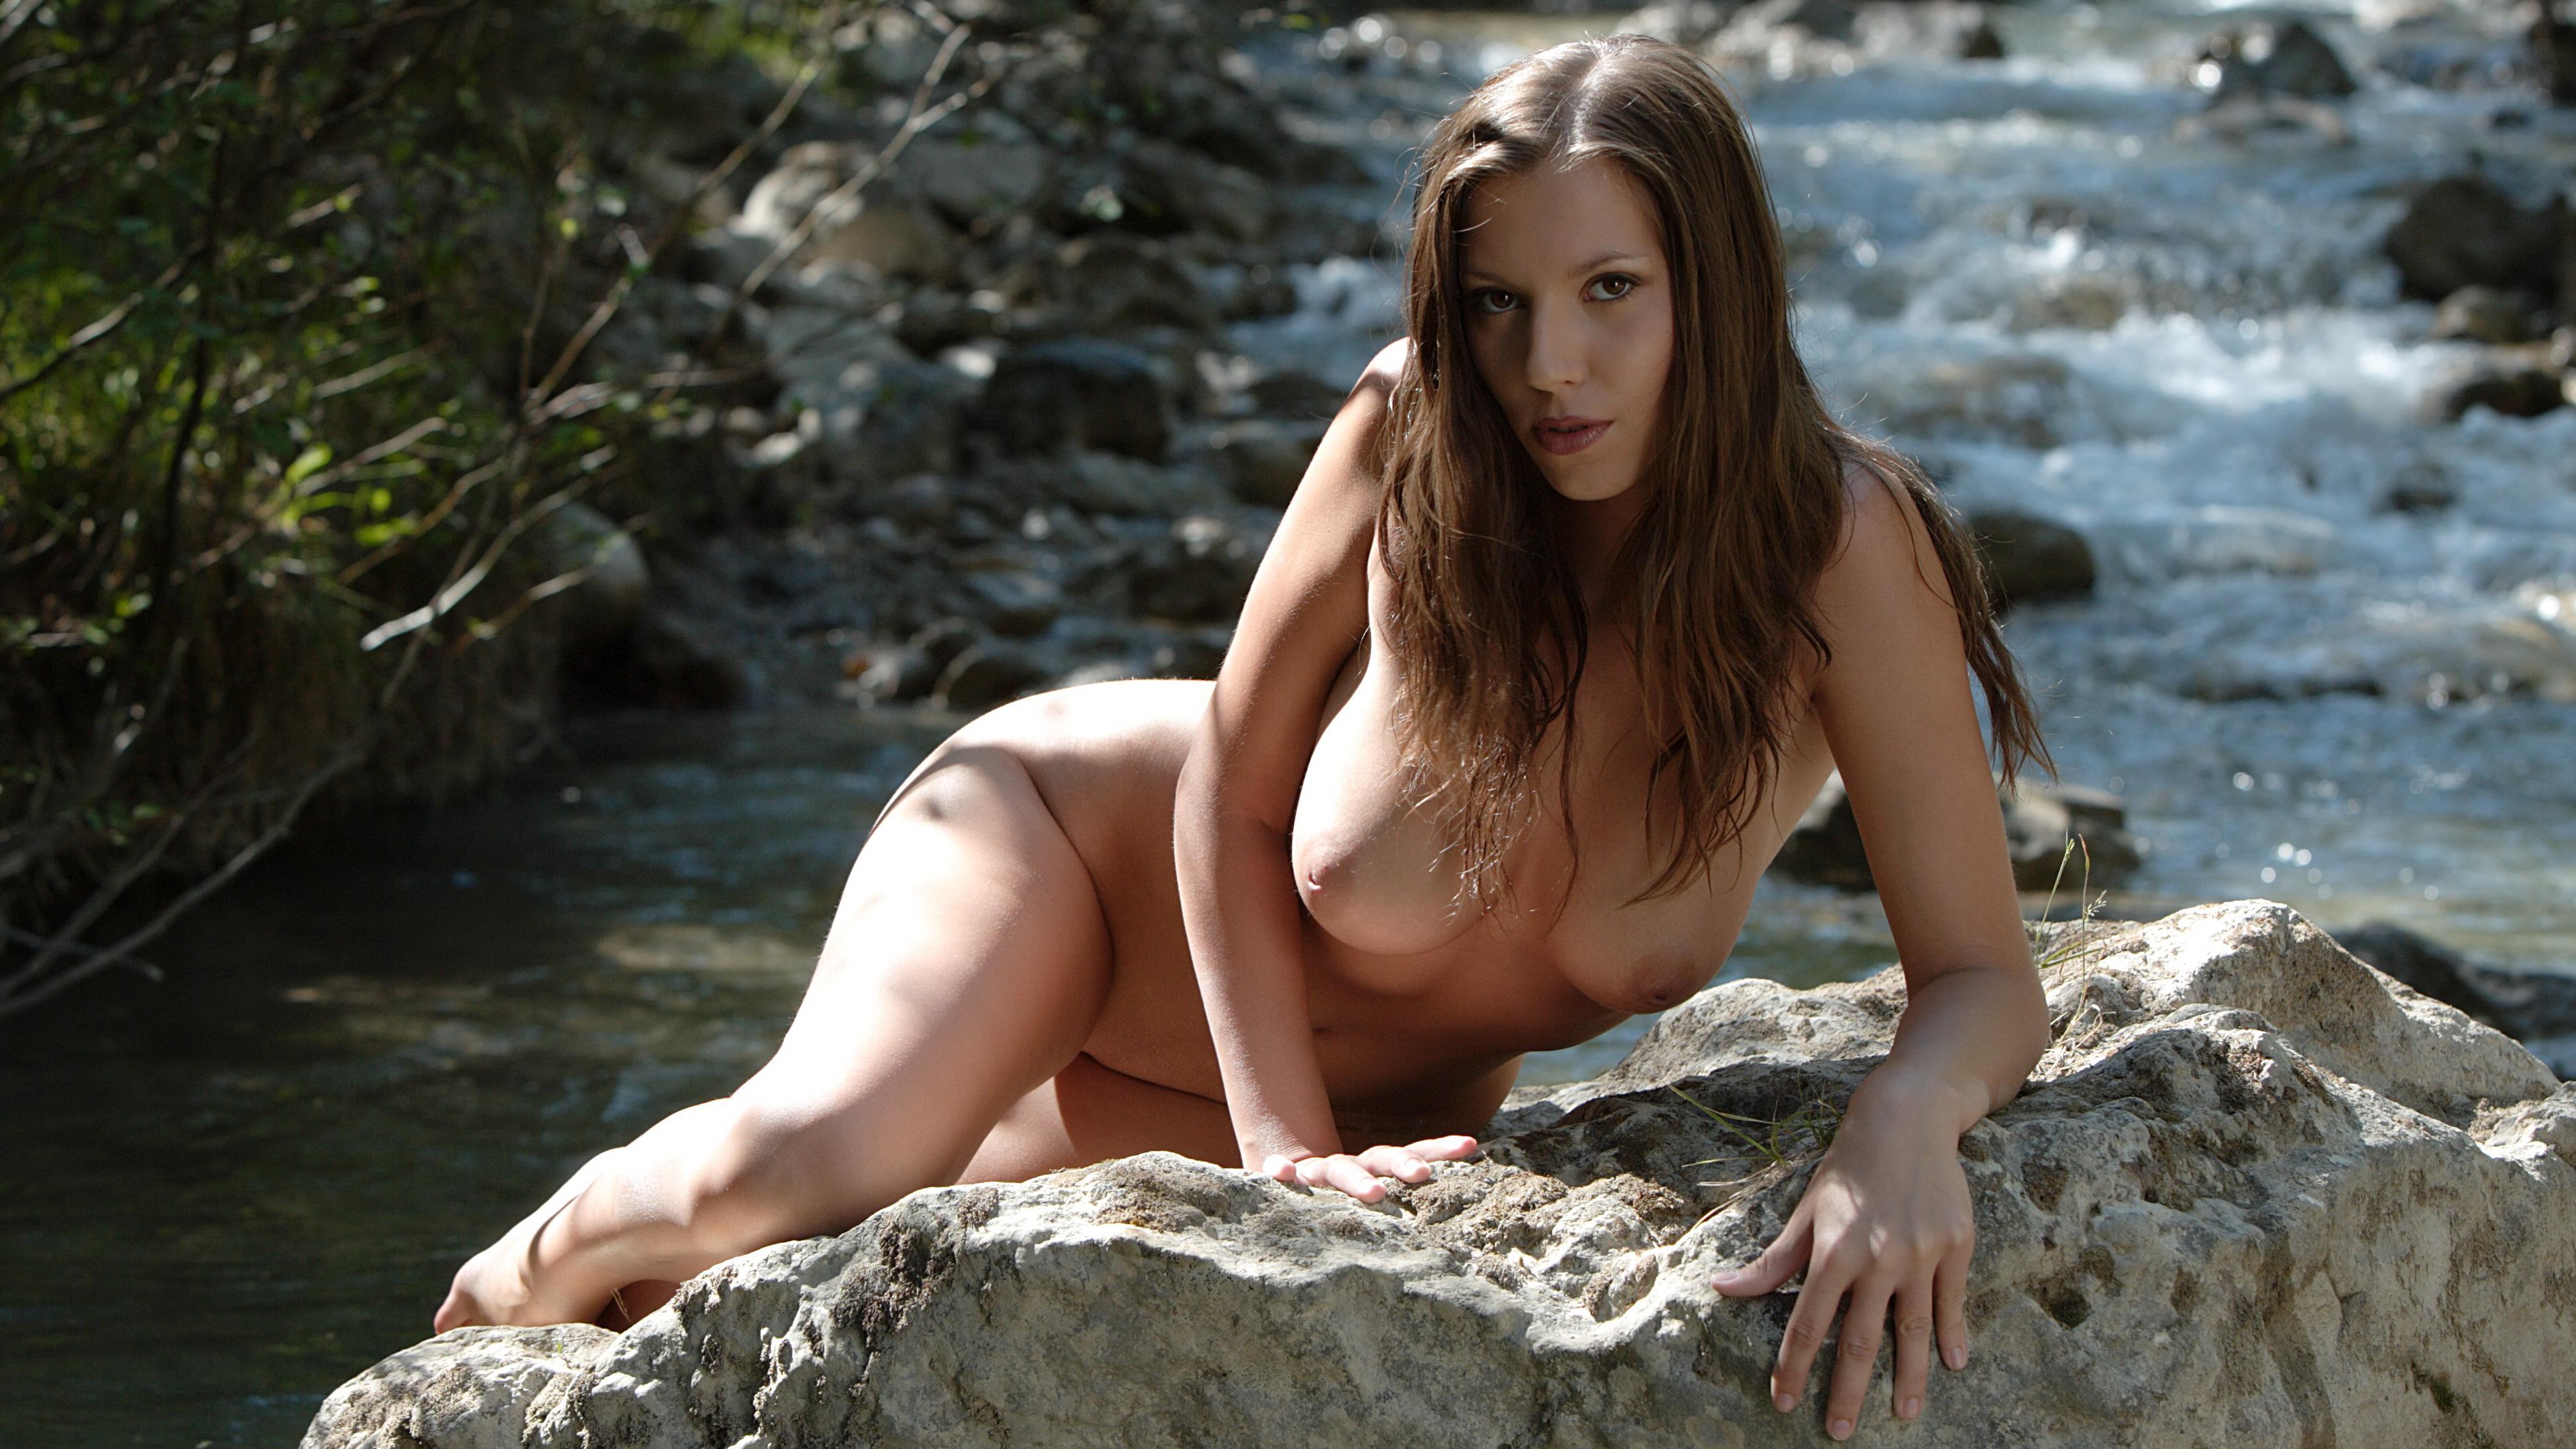 Angela Stone Nude Pics, Page